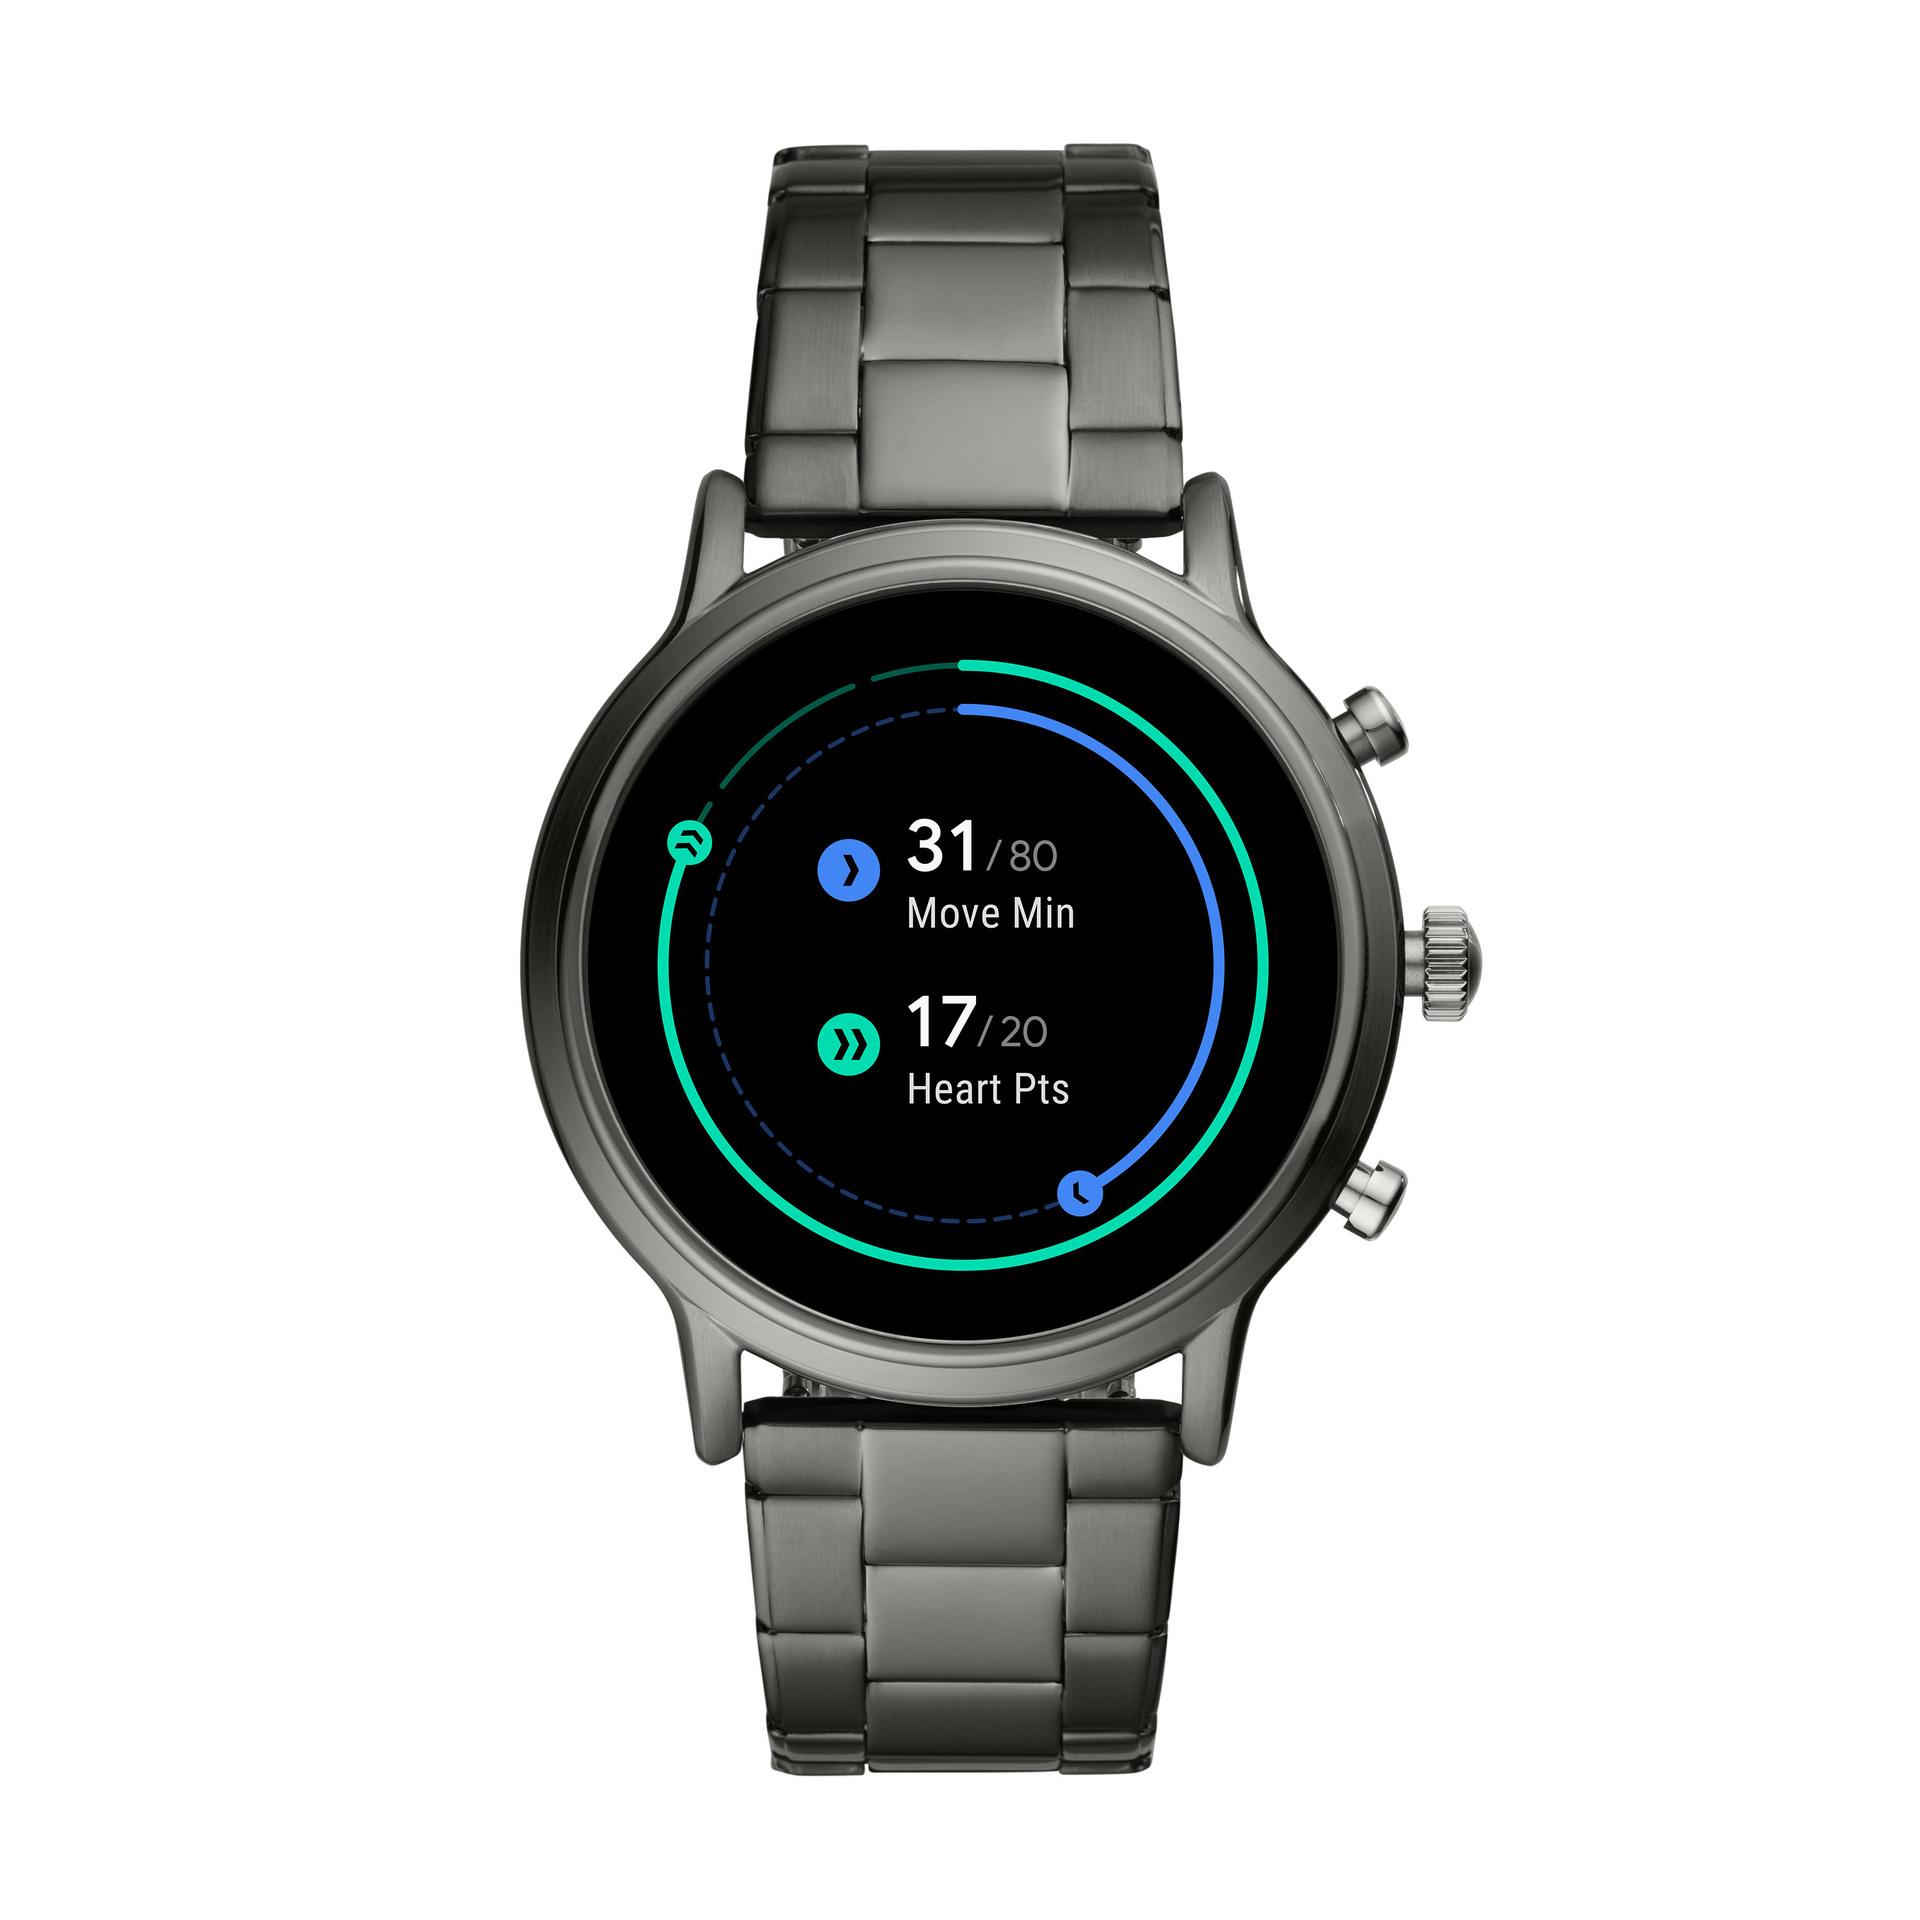 fossil generation 5 wear os smartwatch google fit silver aluminum